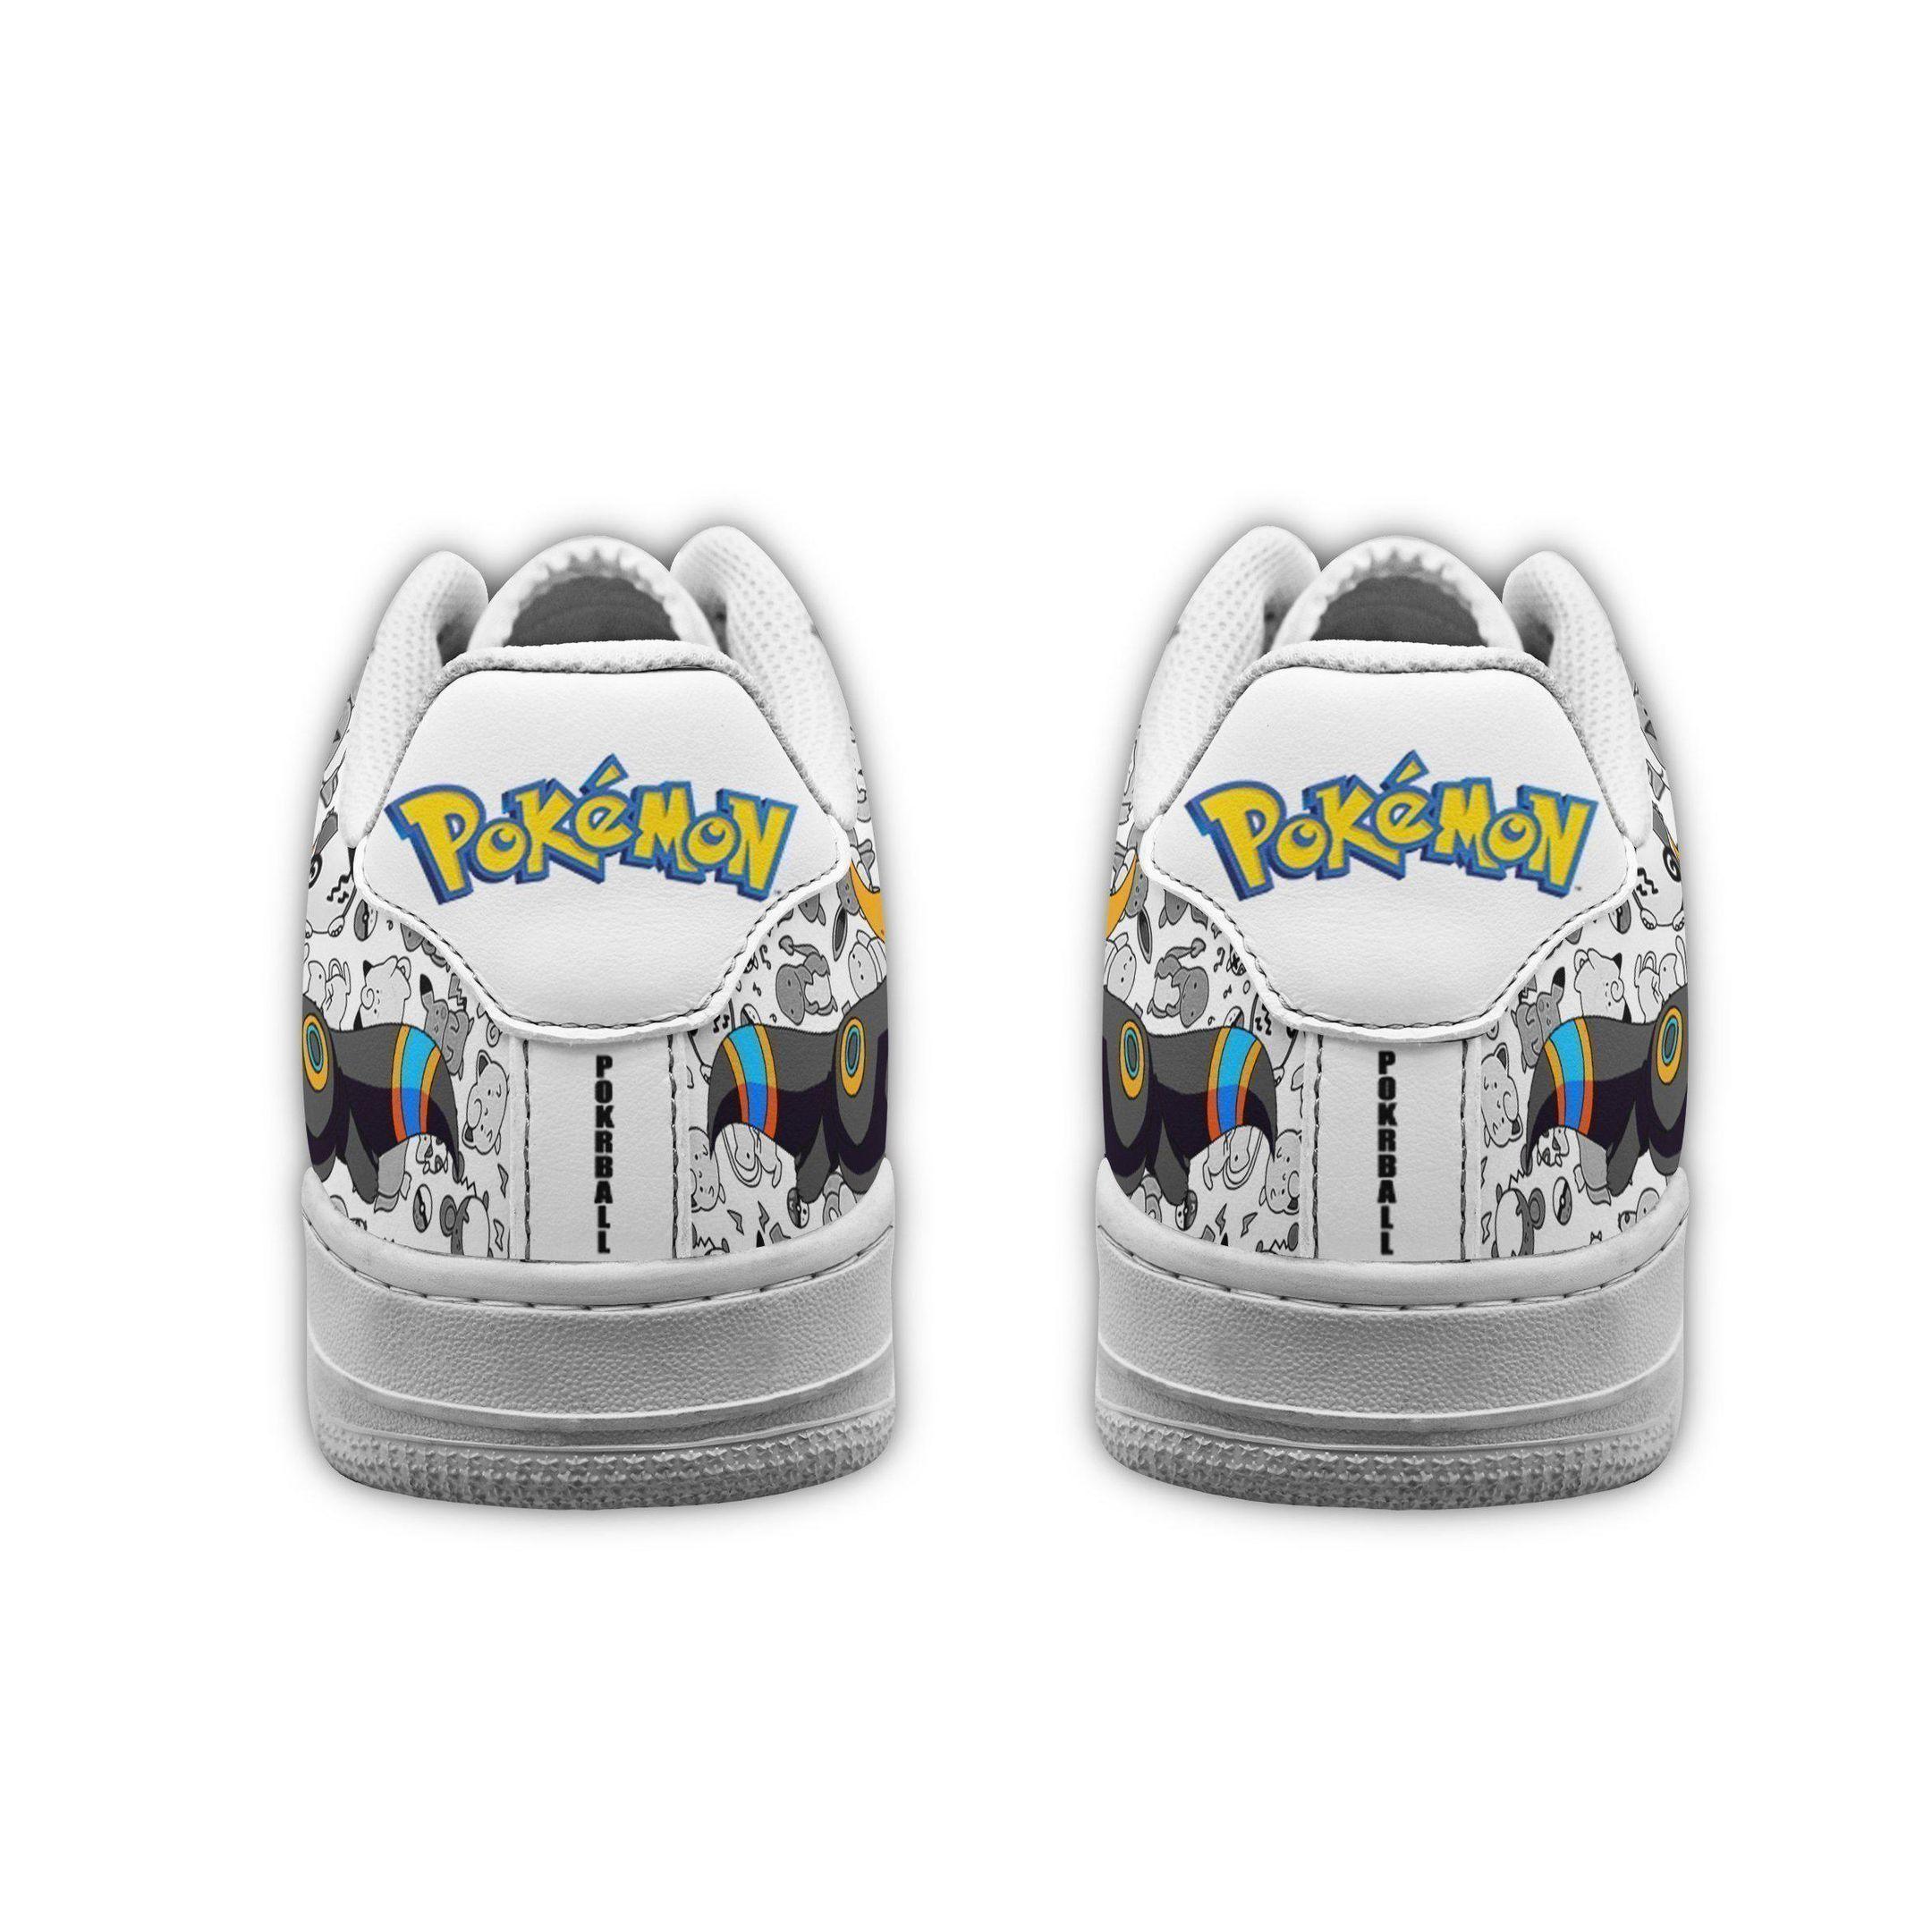 Umbreon Air Shoes Pokemon Shoes Fan Gift Idea GO1012